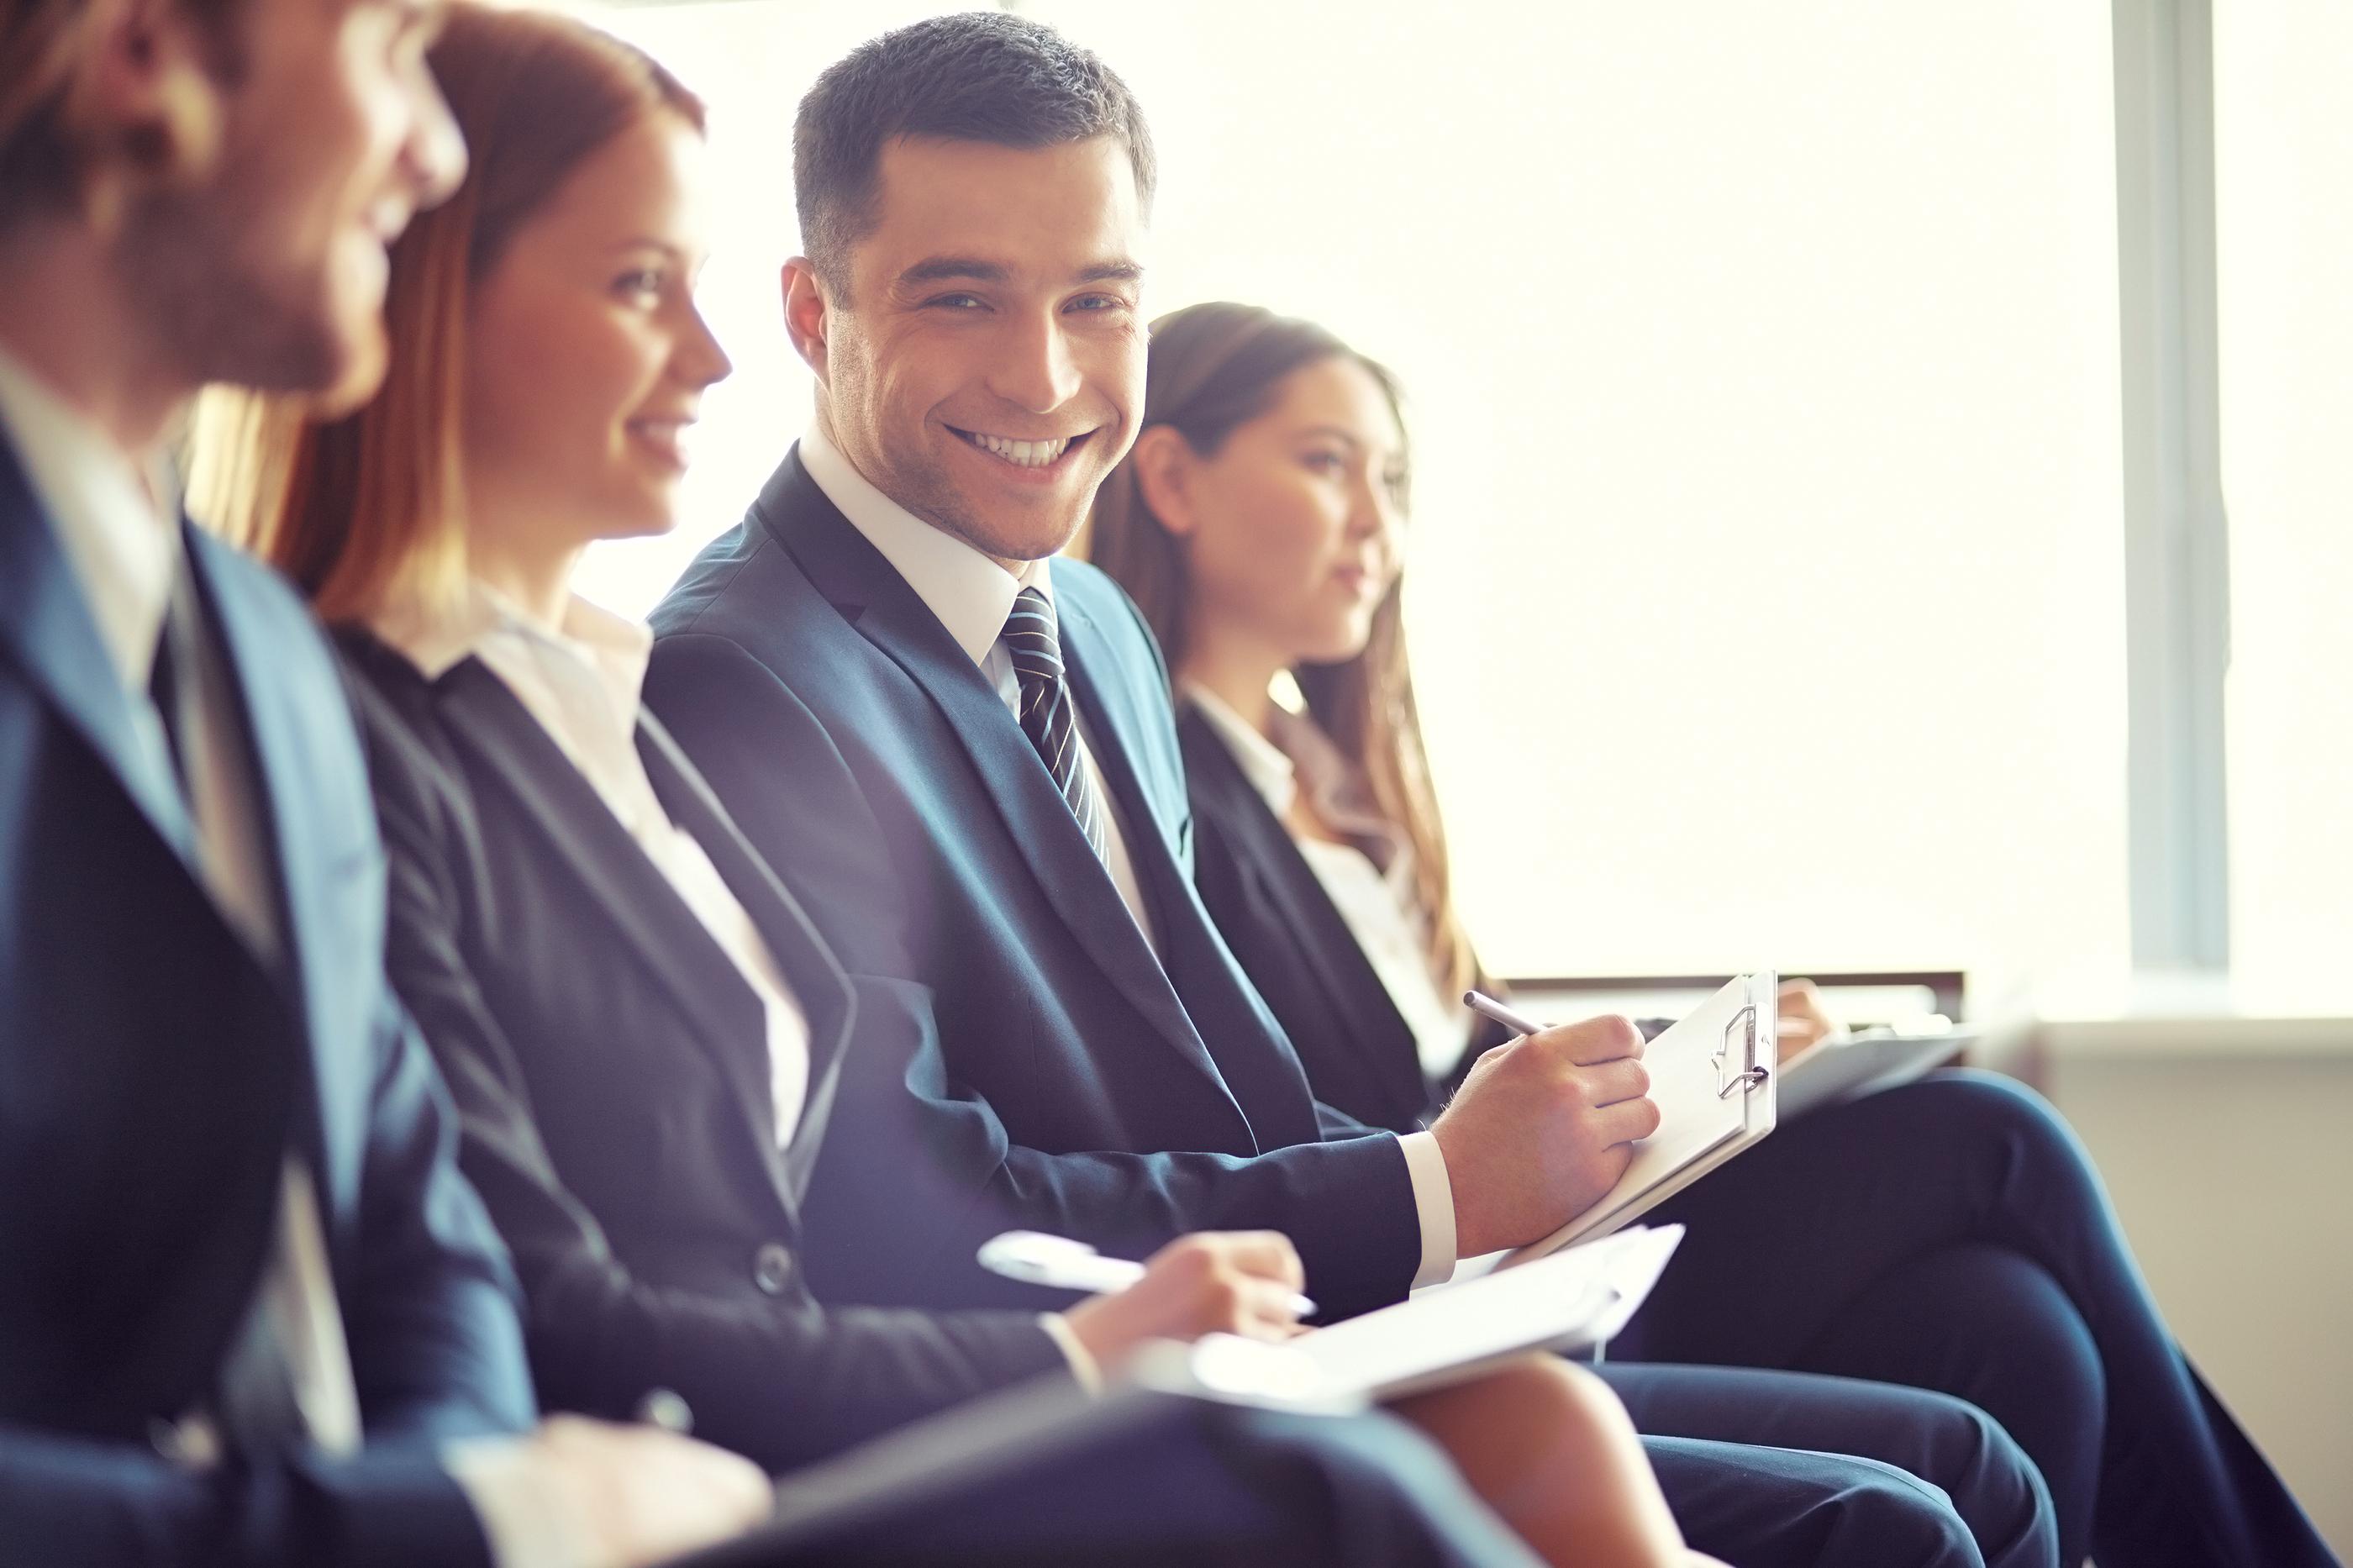 N3 Executive - Talent Advisory